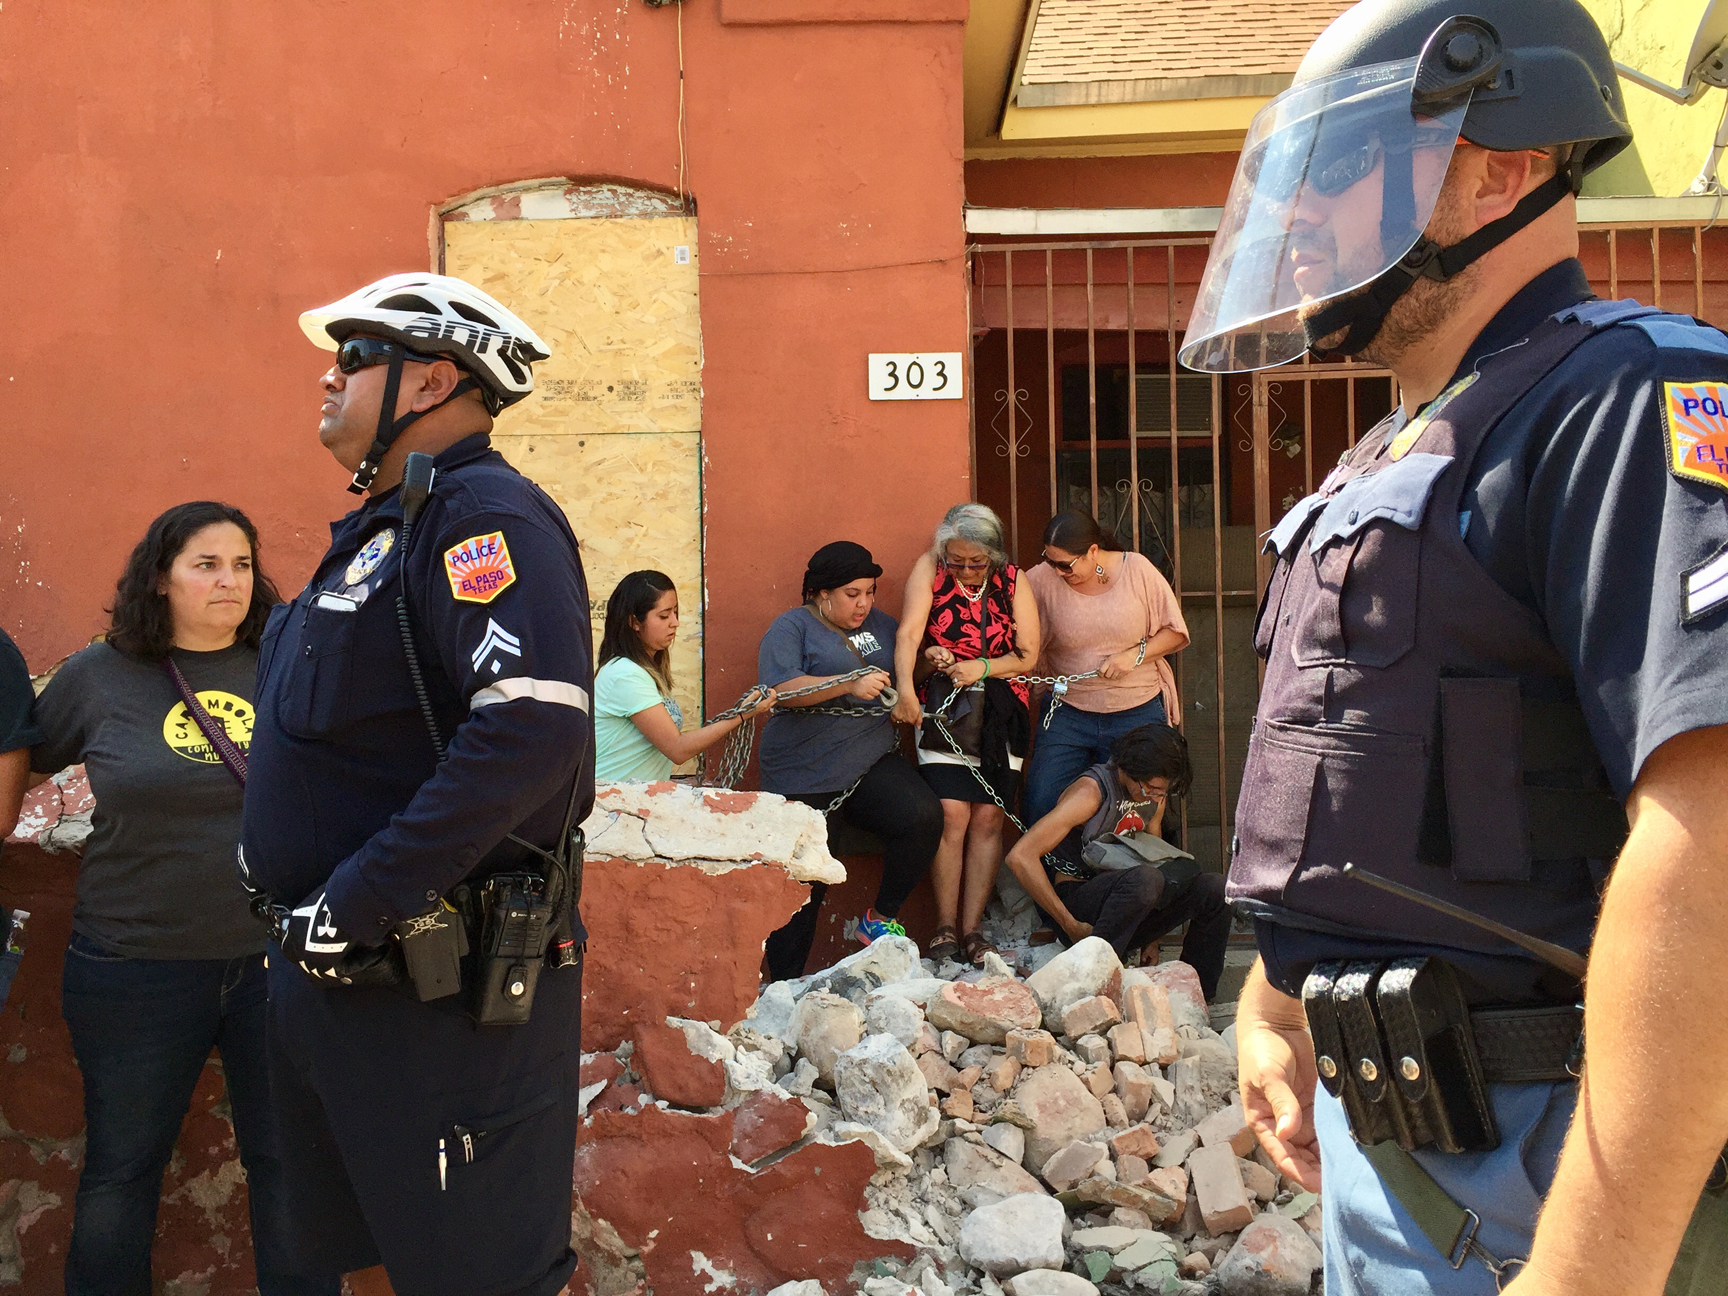 SM.PoliceAndWomenChains.jpg